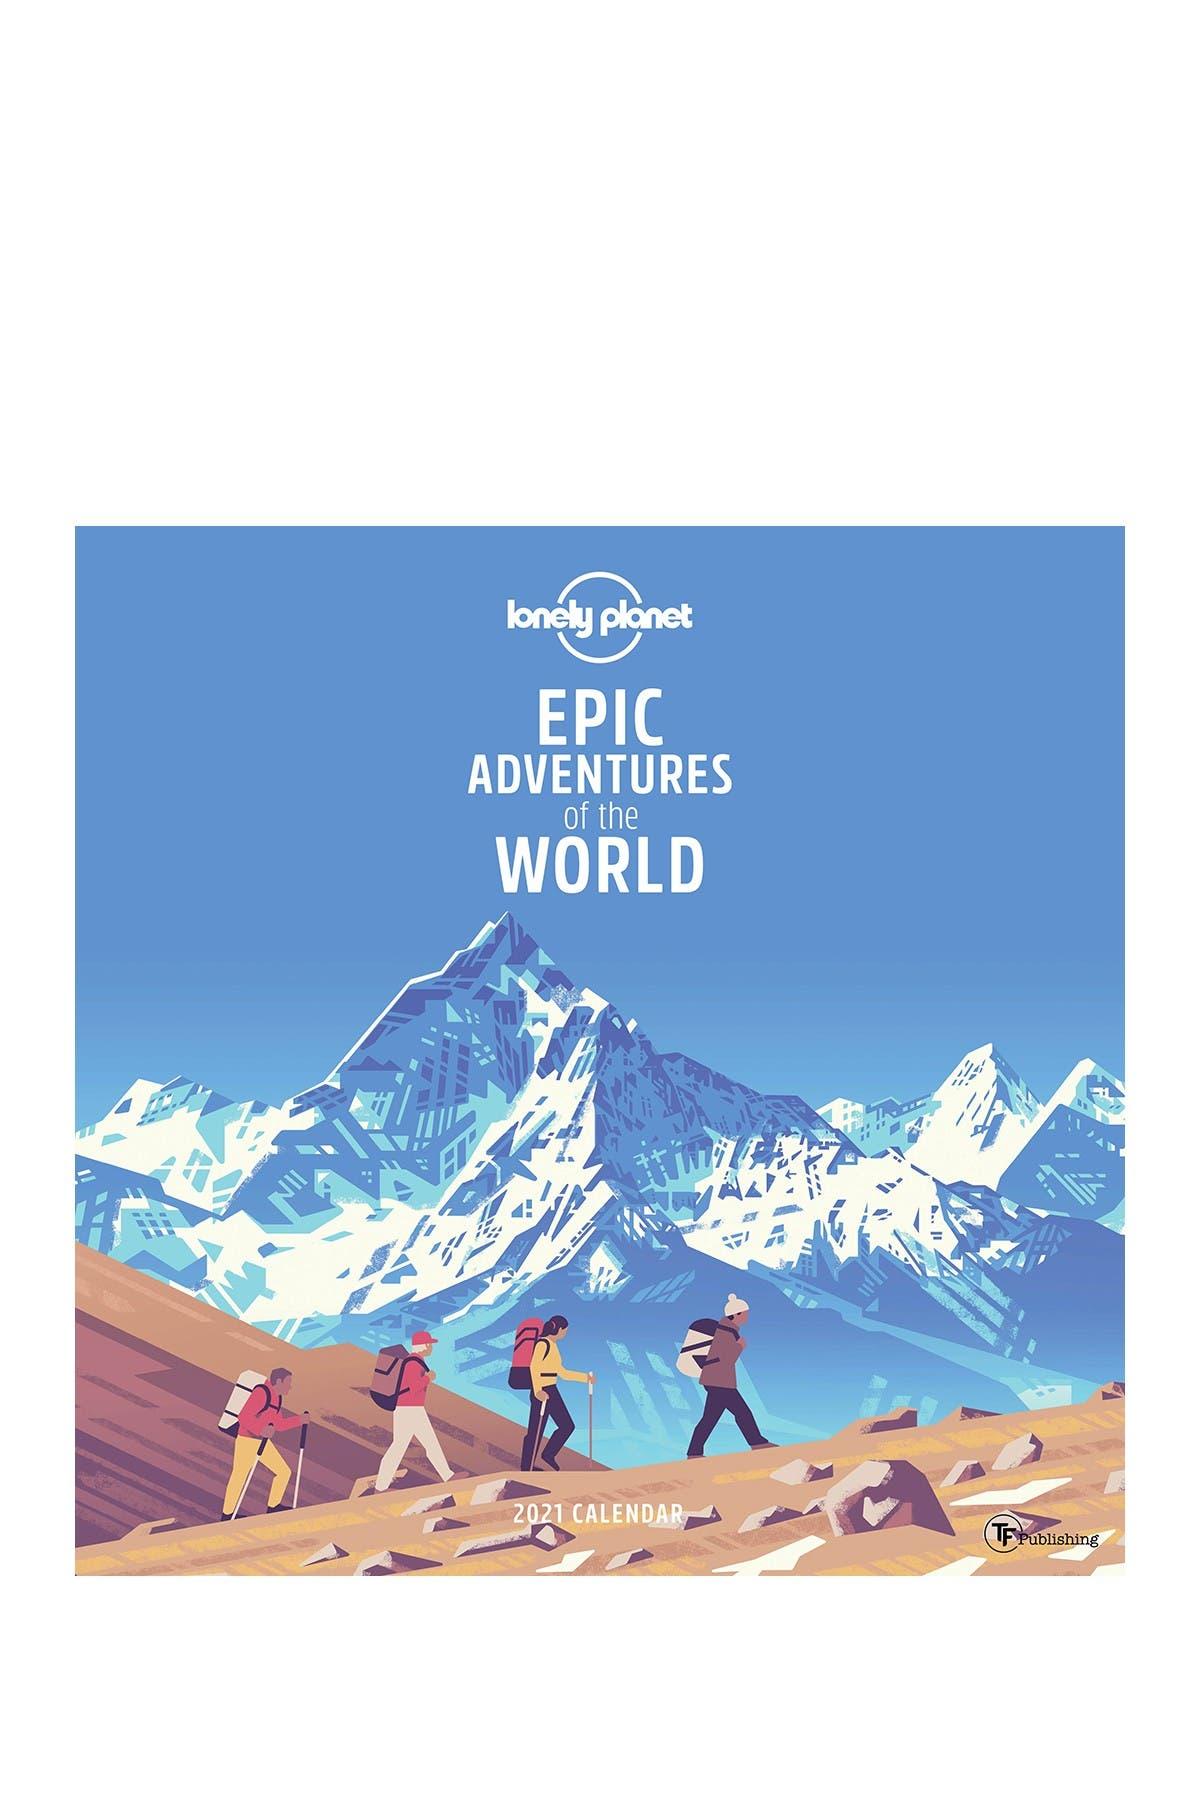 Image of TF Publishing 2021 Epic Adventures Wall Calendar